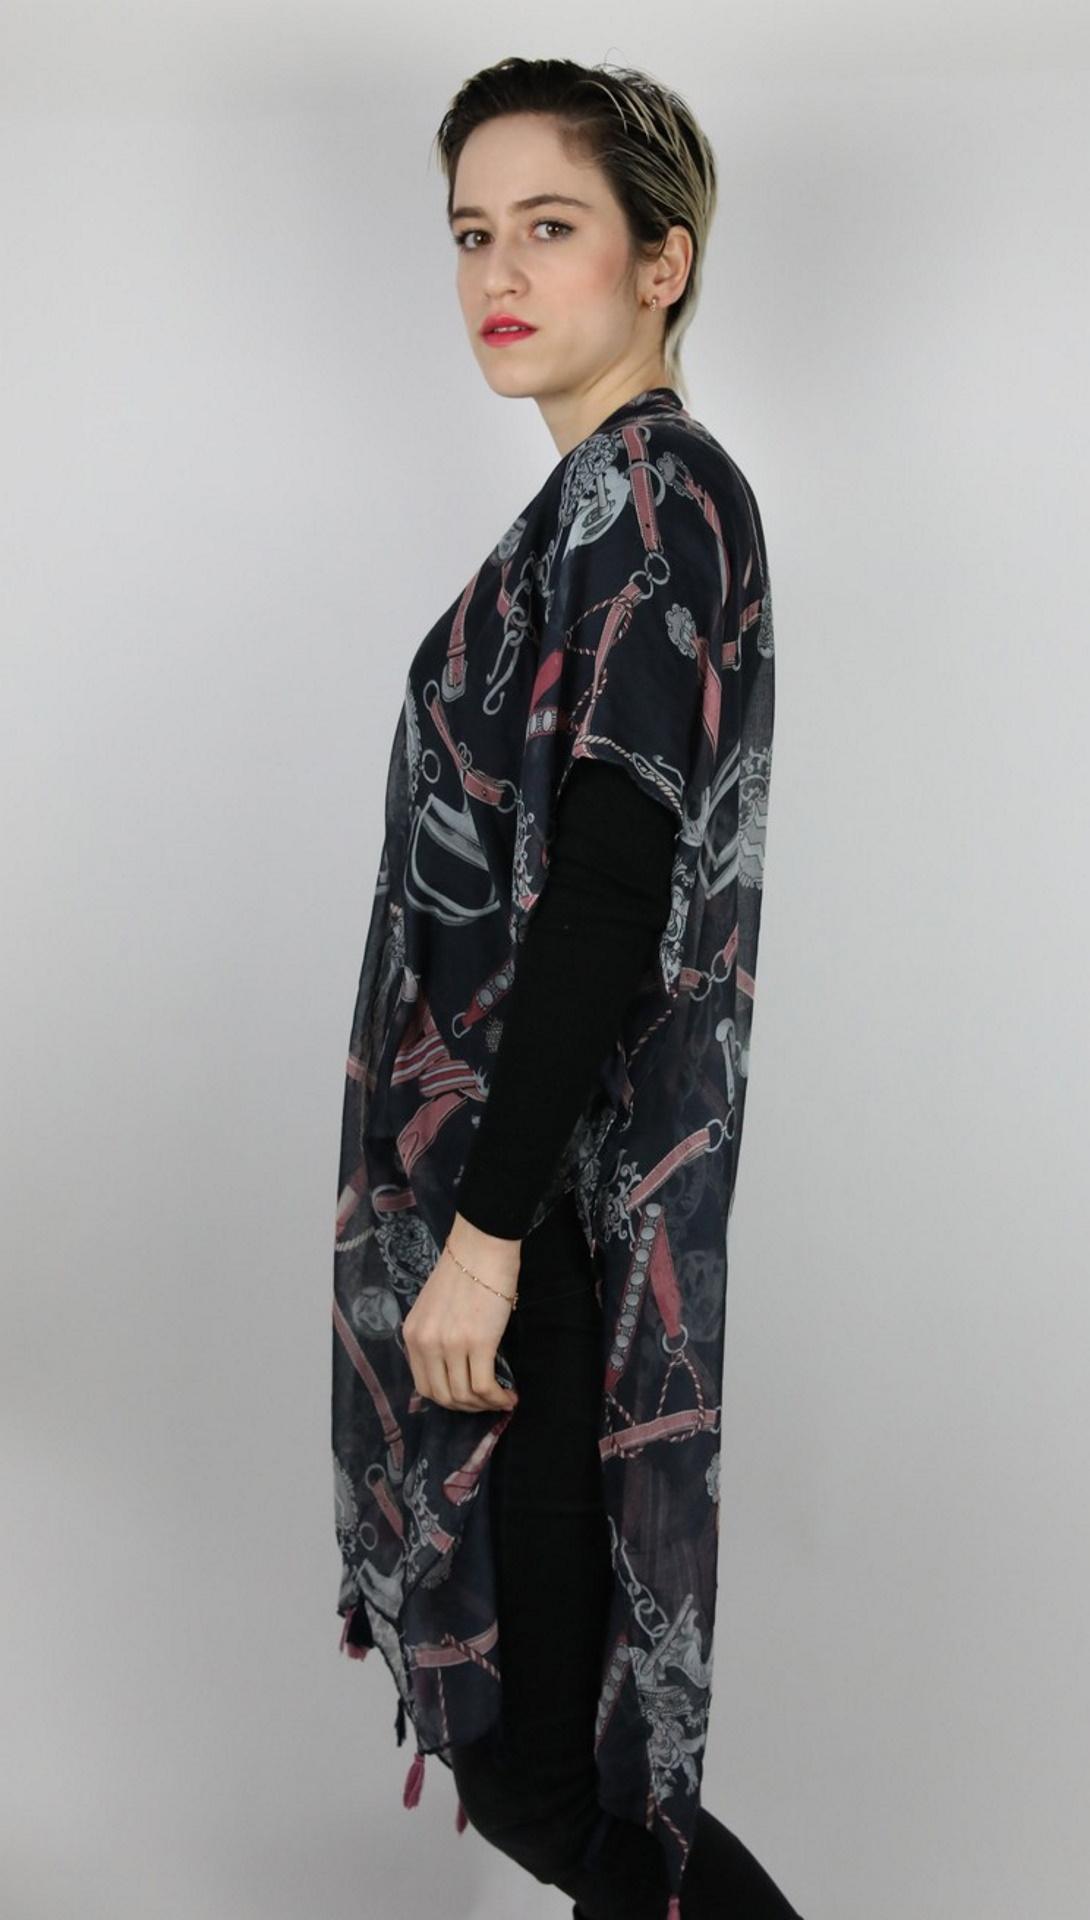 CLOTHES09 STOLA DONNA FOULARD CARDIGAN COPRISPALLE 2 1stAmerican elegante stola da donna foulard cardigan coprispalle